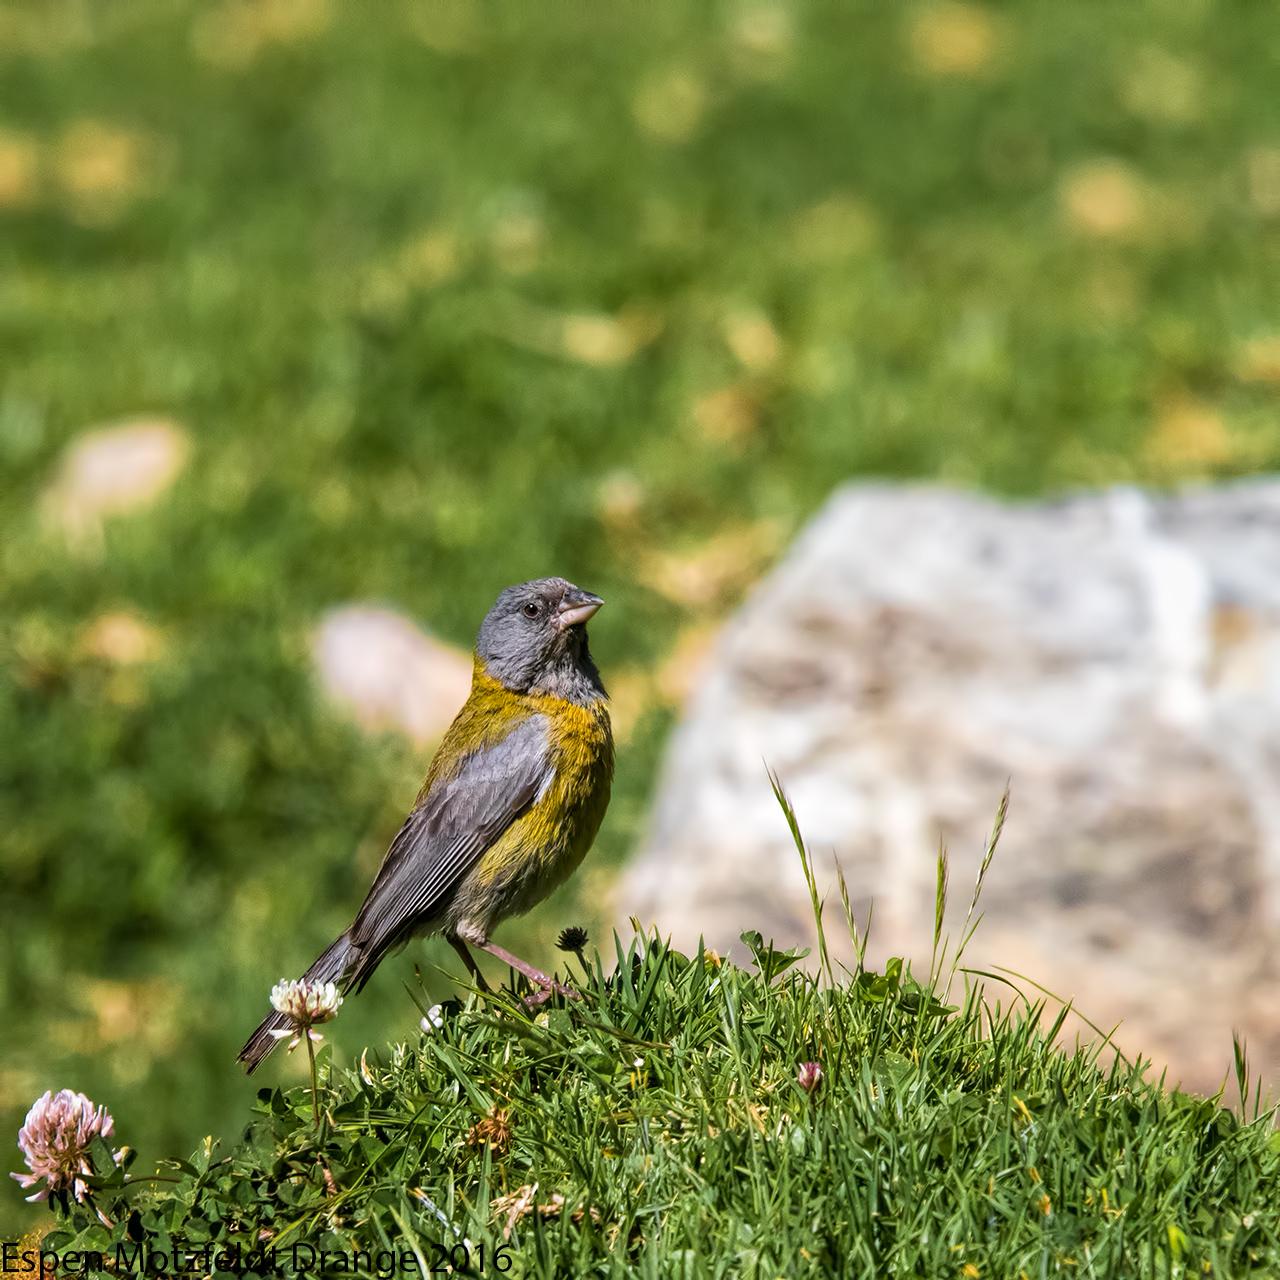 Peruvian-Sierra-finch